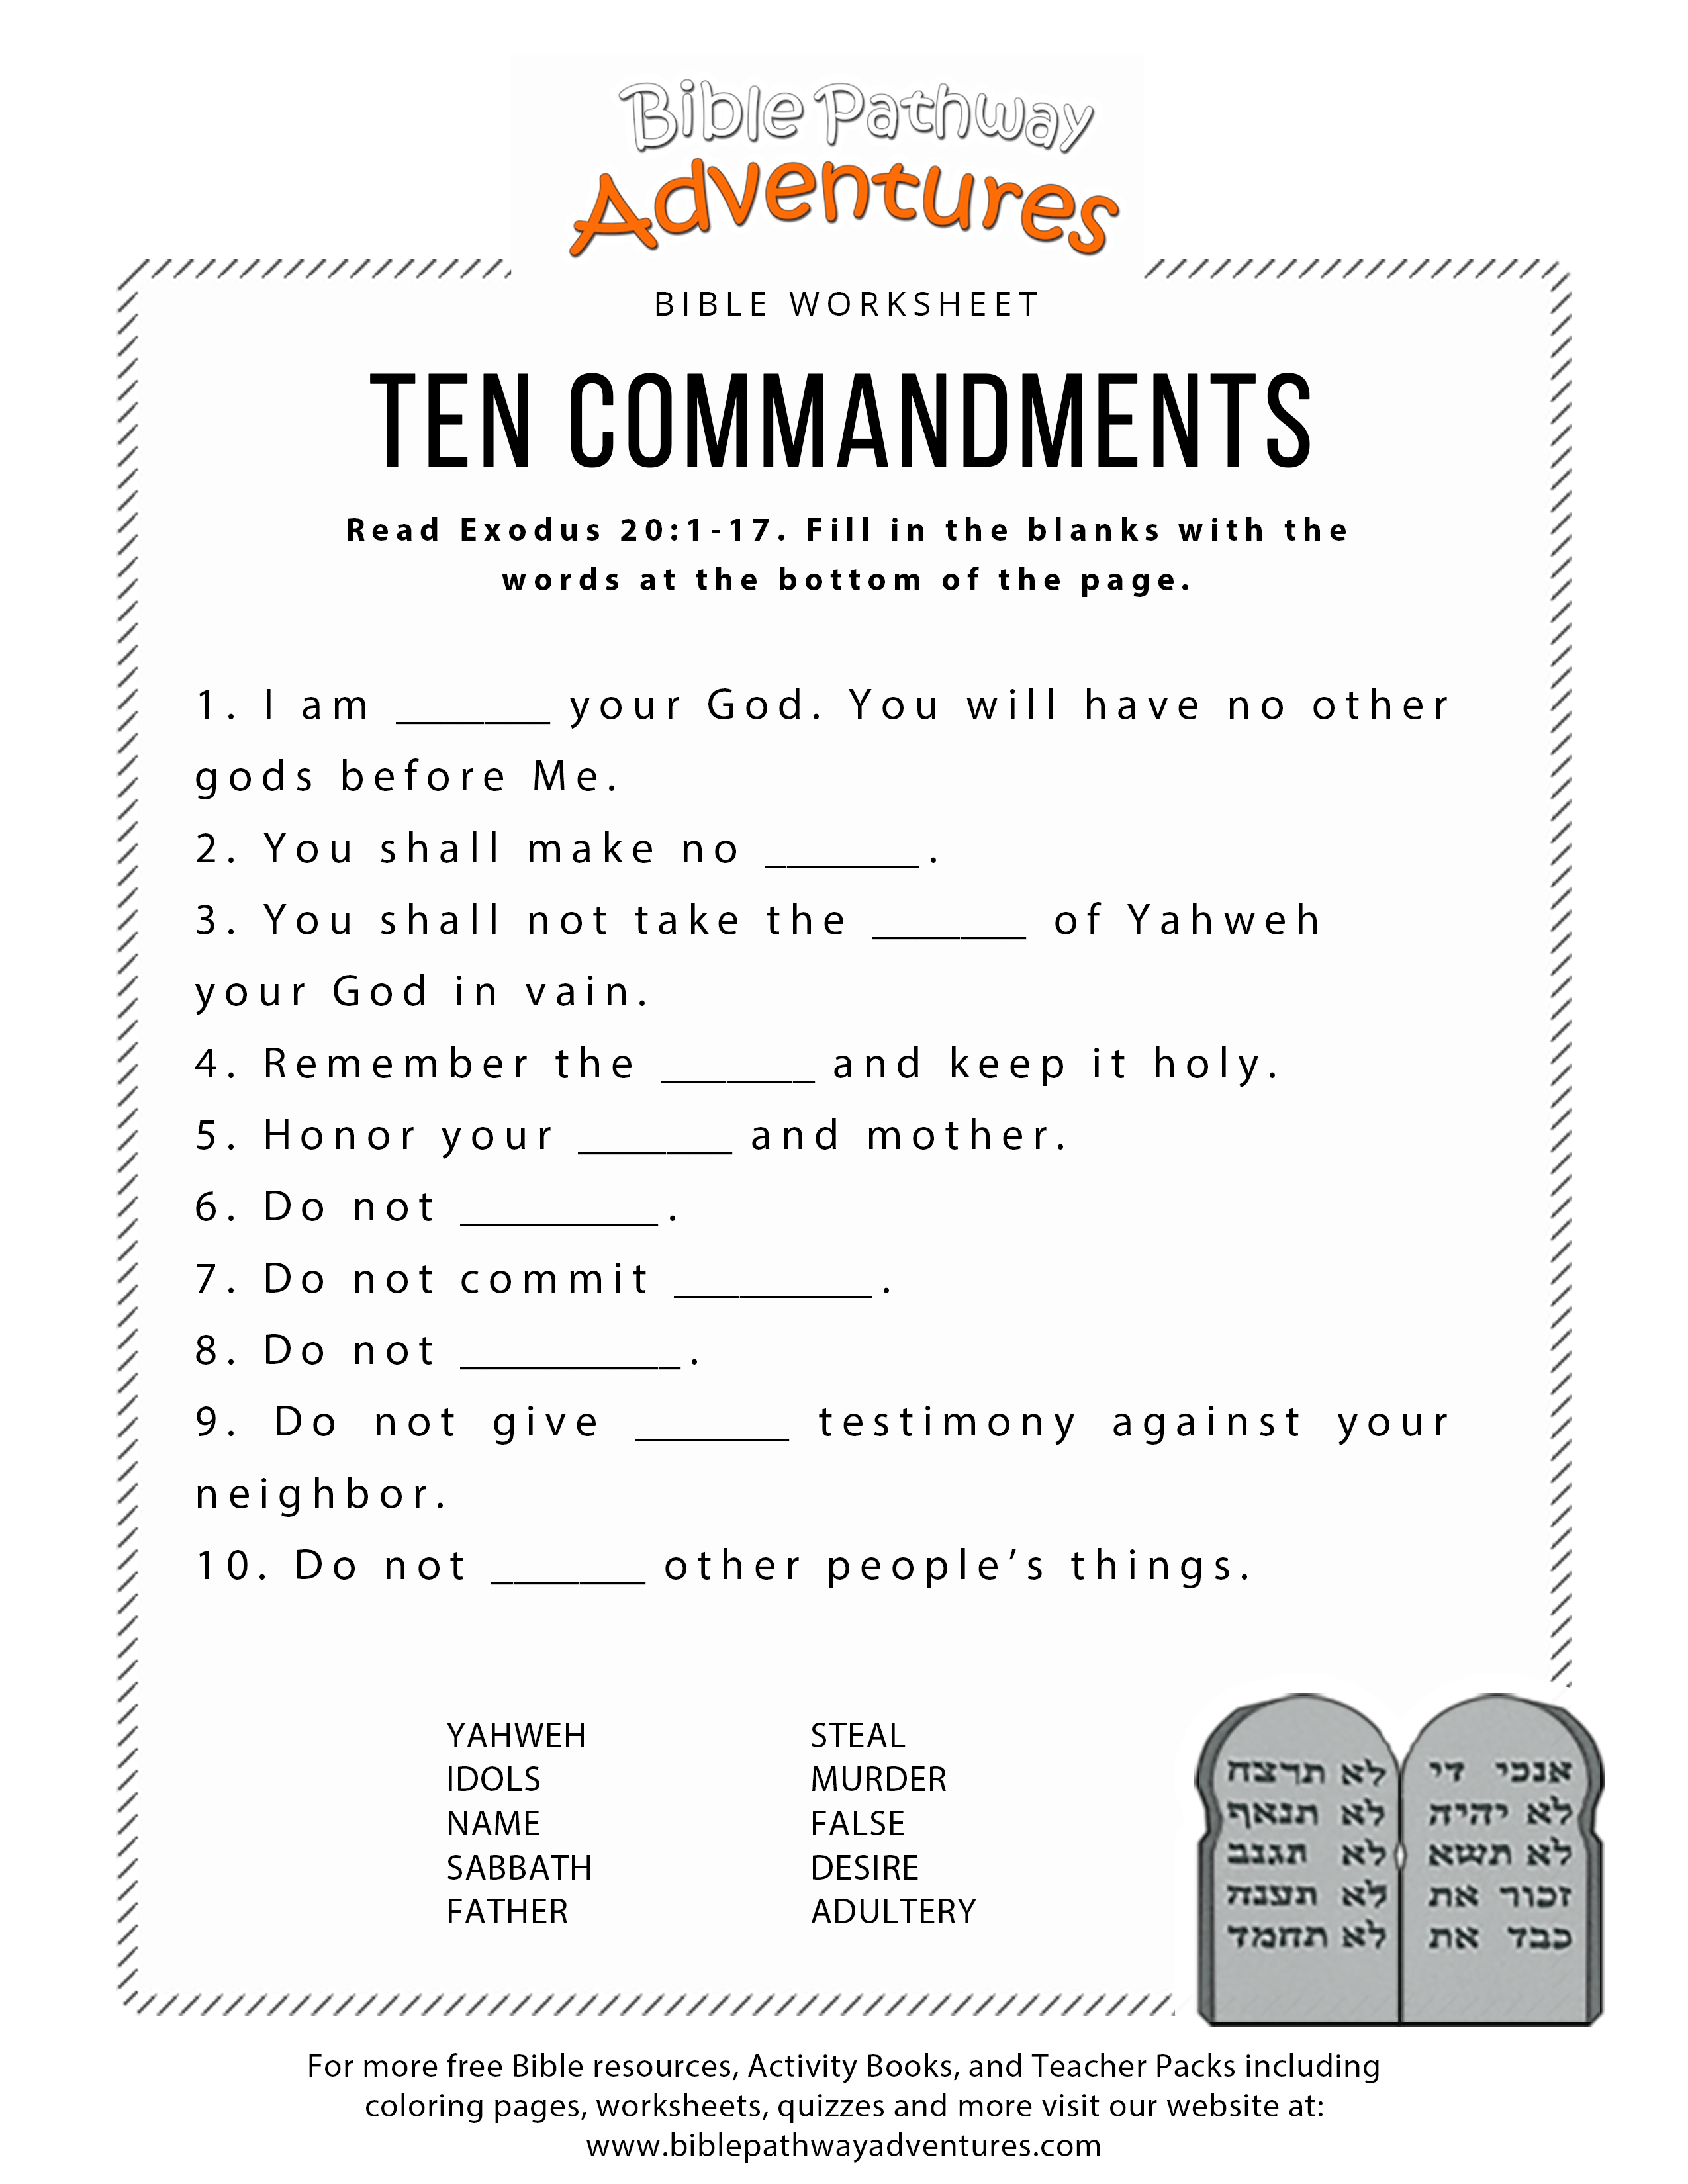 Ten Commandments Worksheet For Kids | Worksheets For Psr | Bible - Free Printable Children's Bible Lessons Worksheets